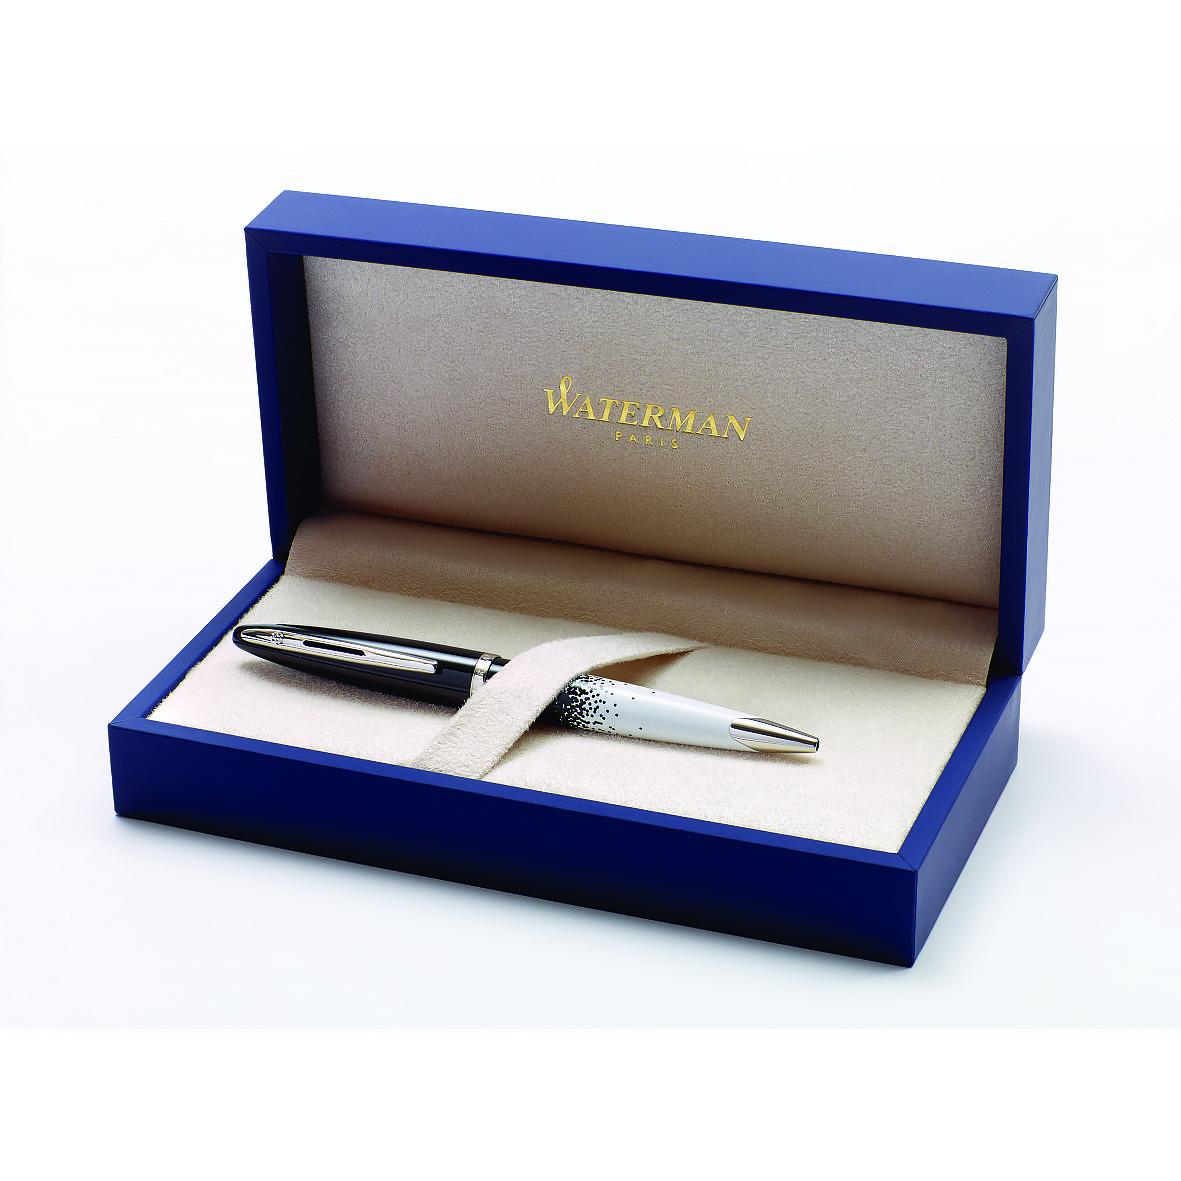 Шариковая ручка - Waterman Carene M